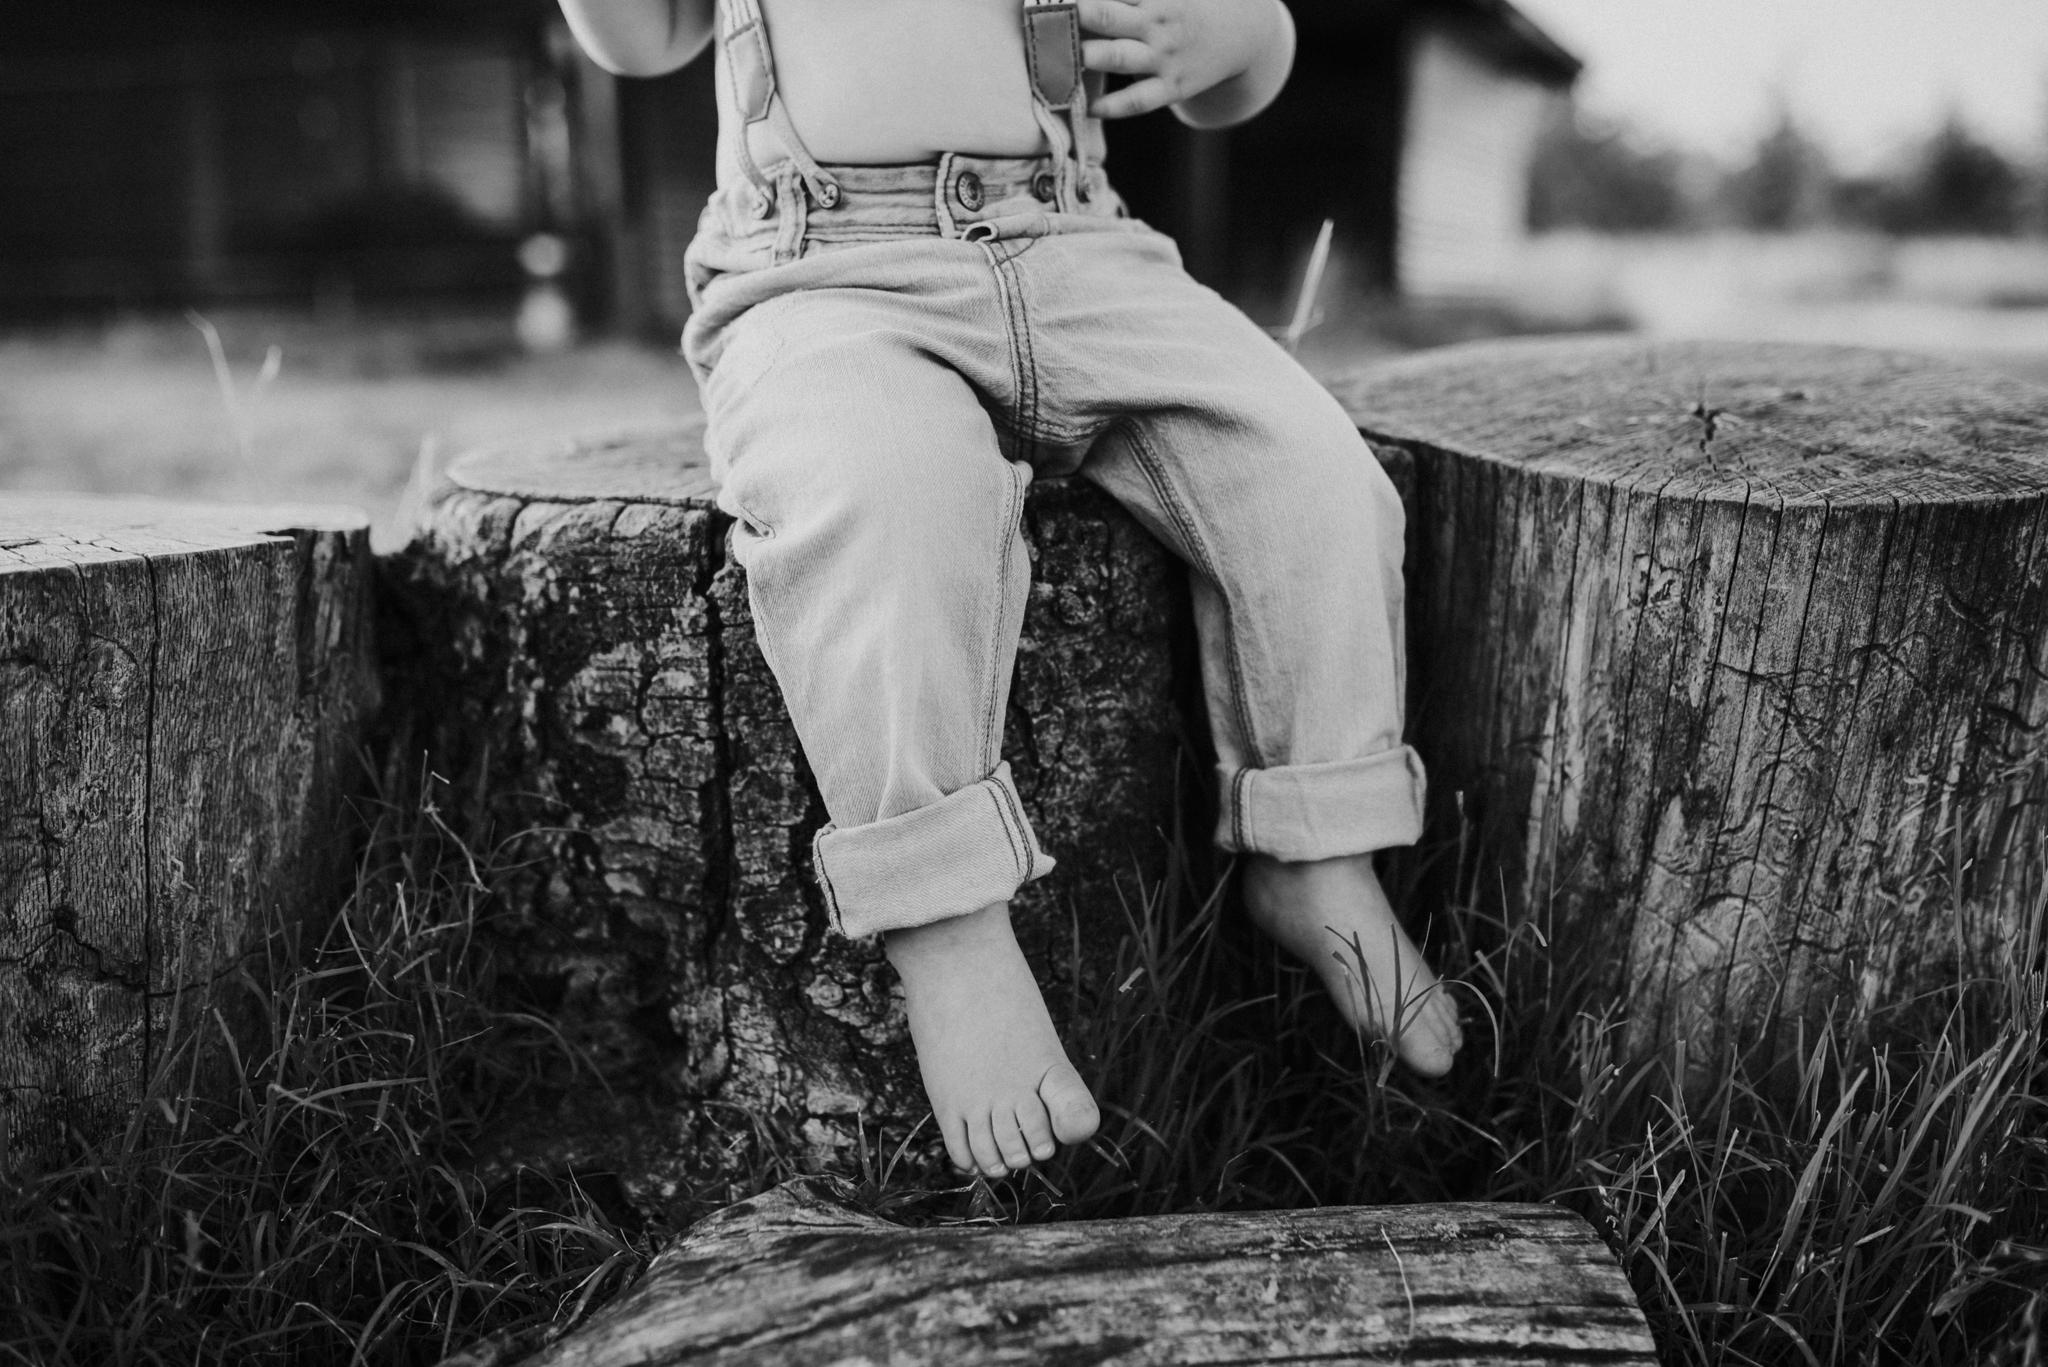 Graham-18 months-42.jpg